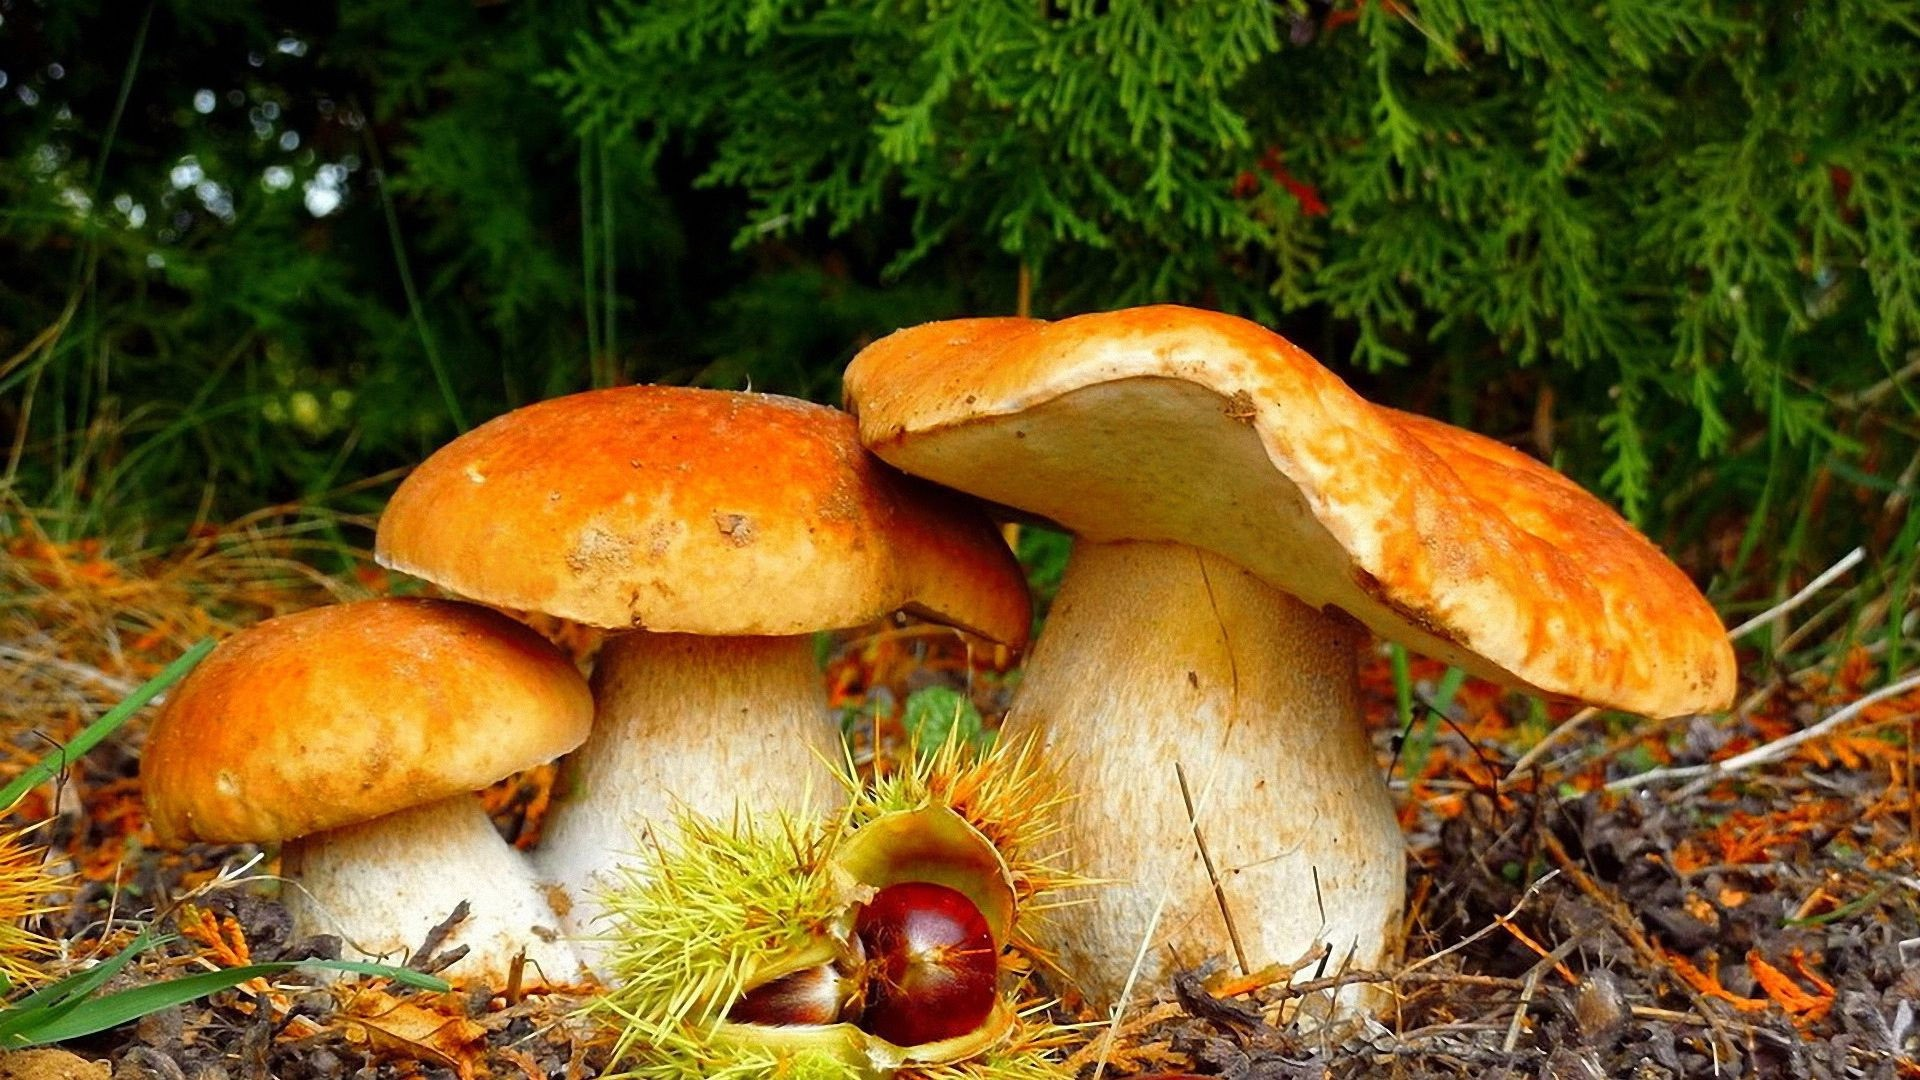 Mushroom Background Wallpaper